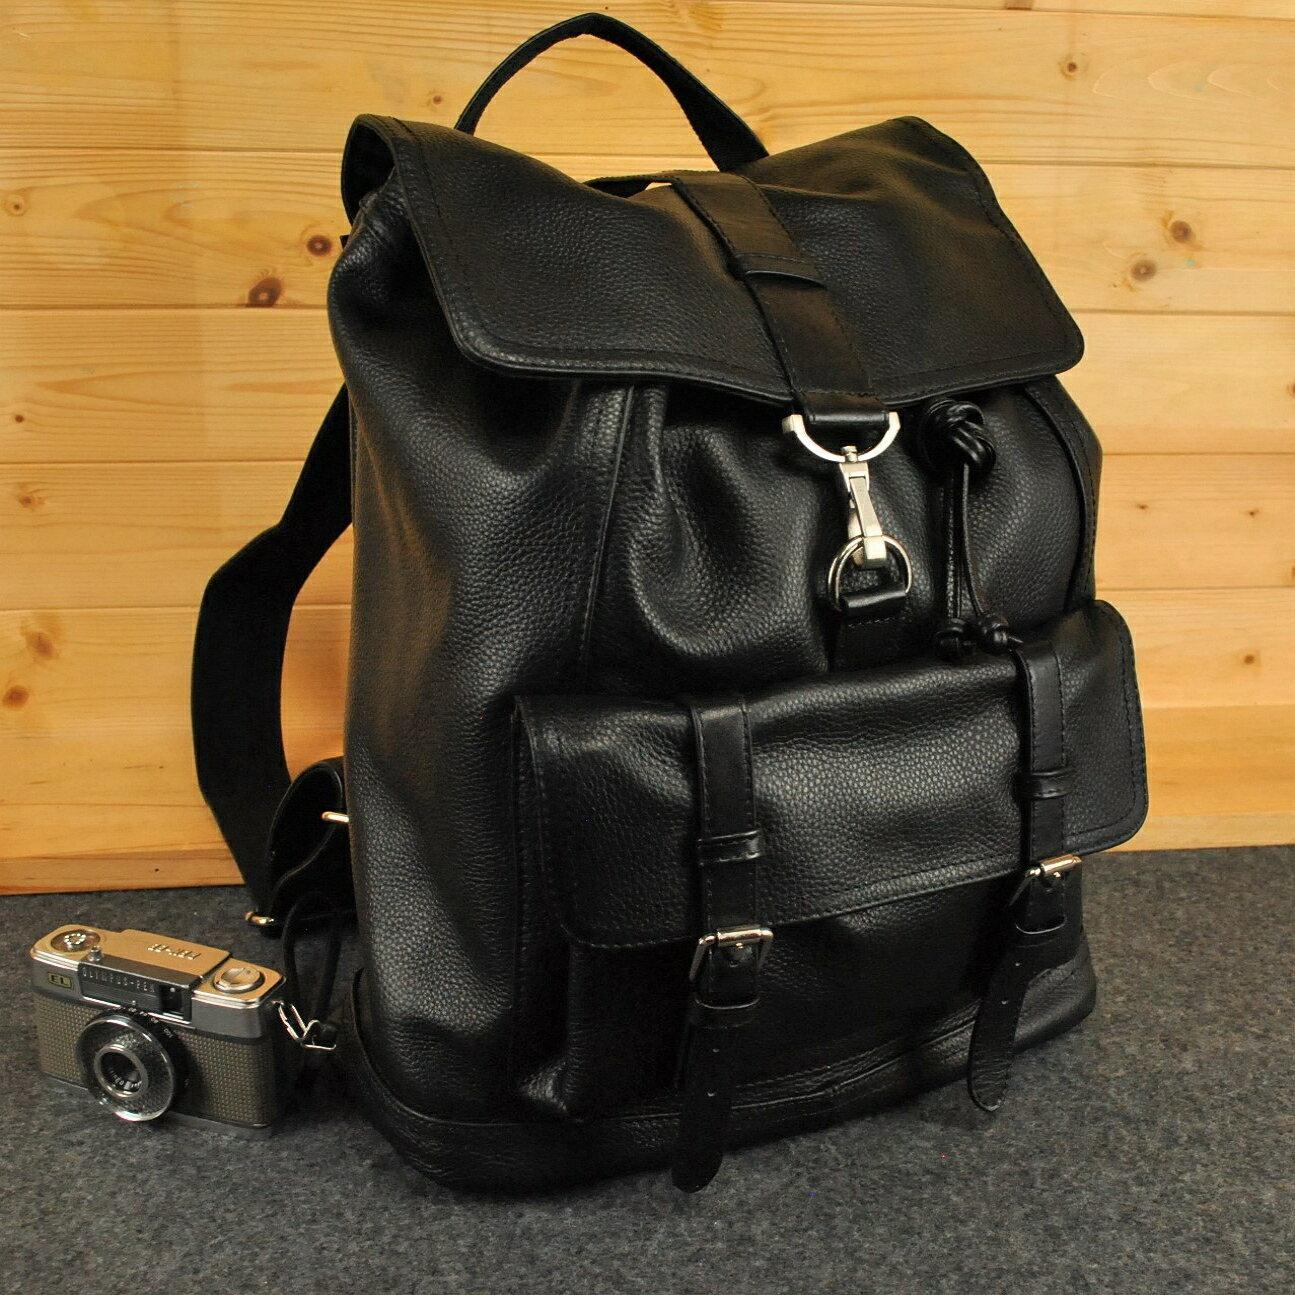 AG設計款 全牛皮筆電層 後背包 大容量 高質感多脂摔紋牛皮感 男女可用 Coach改良版型